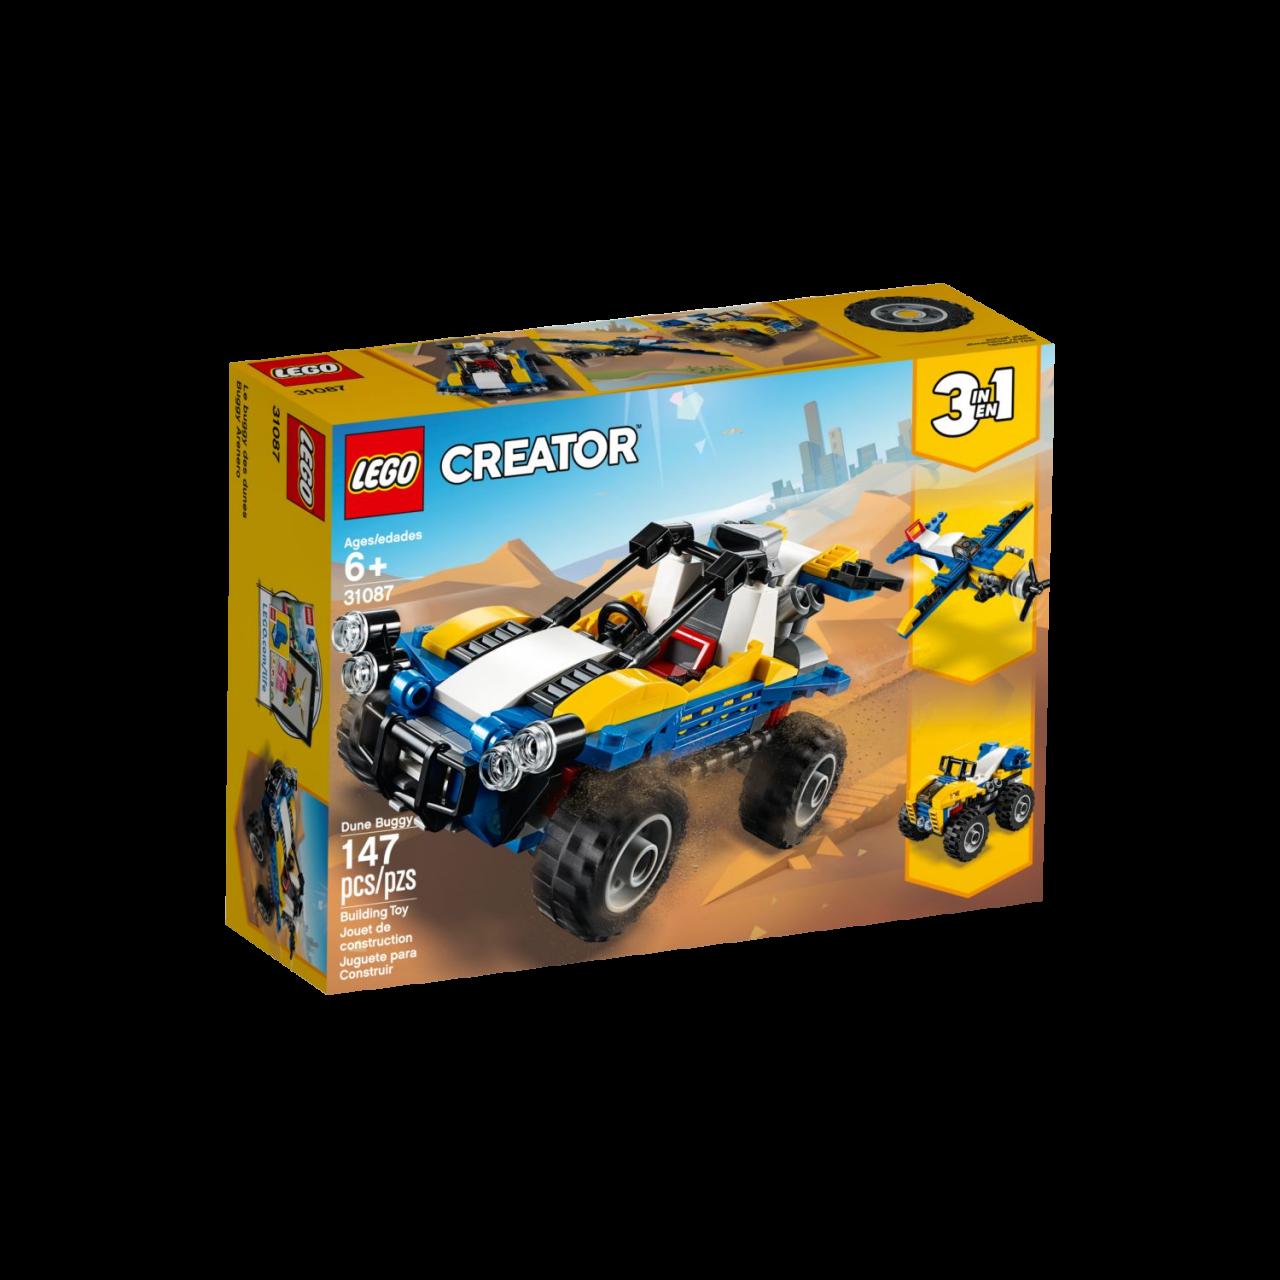 LEGO CREATOR 31087 Strandbuggy